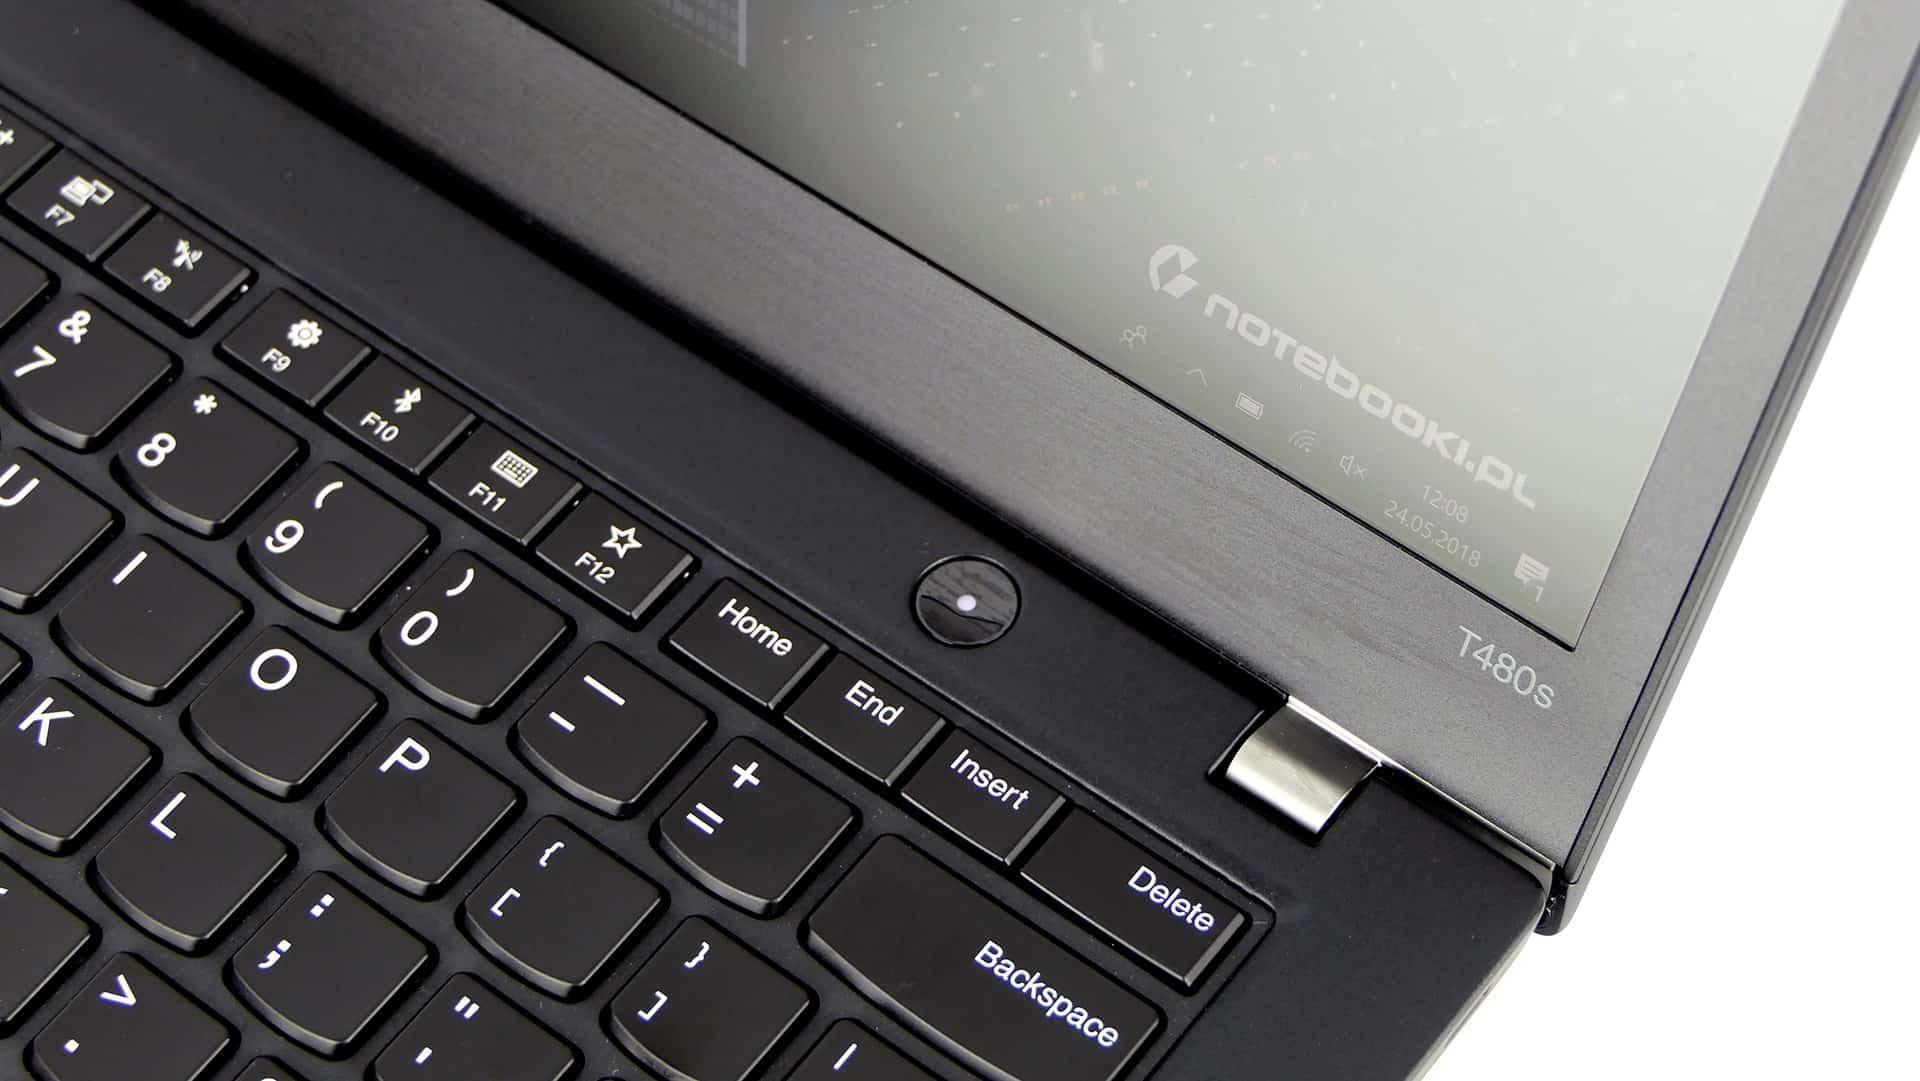 Lenovo ThinkPad T480s - klawiatura orazprzycisk zasilania